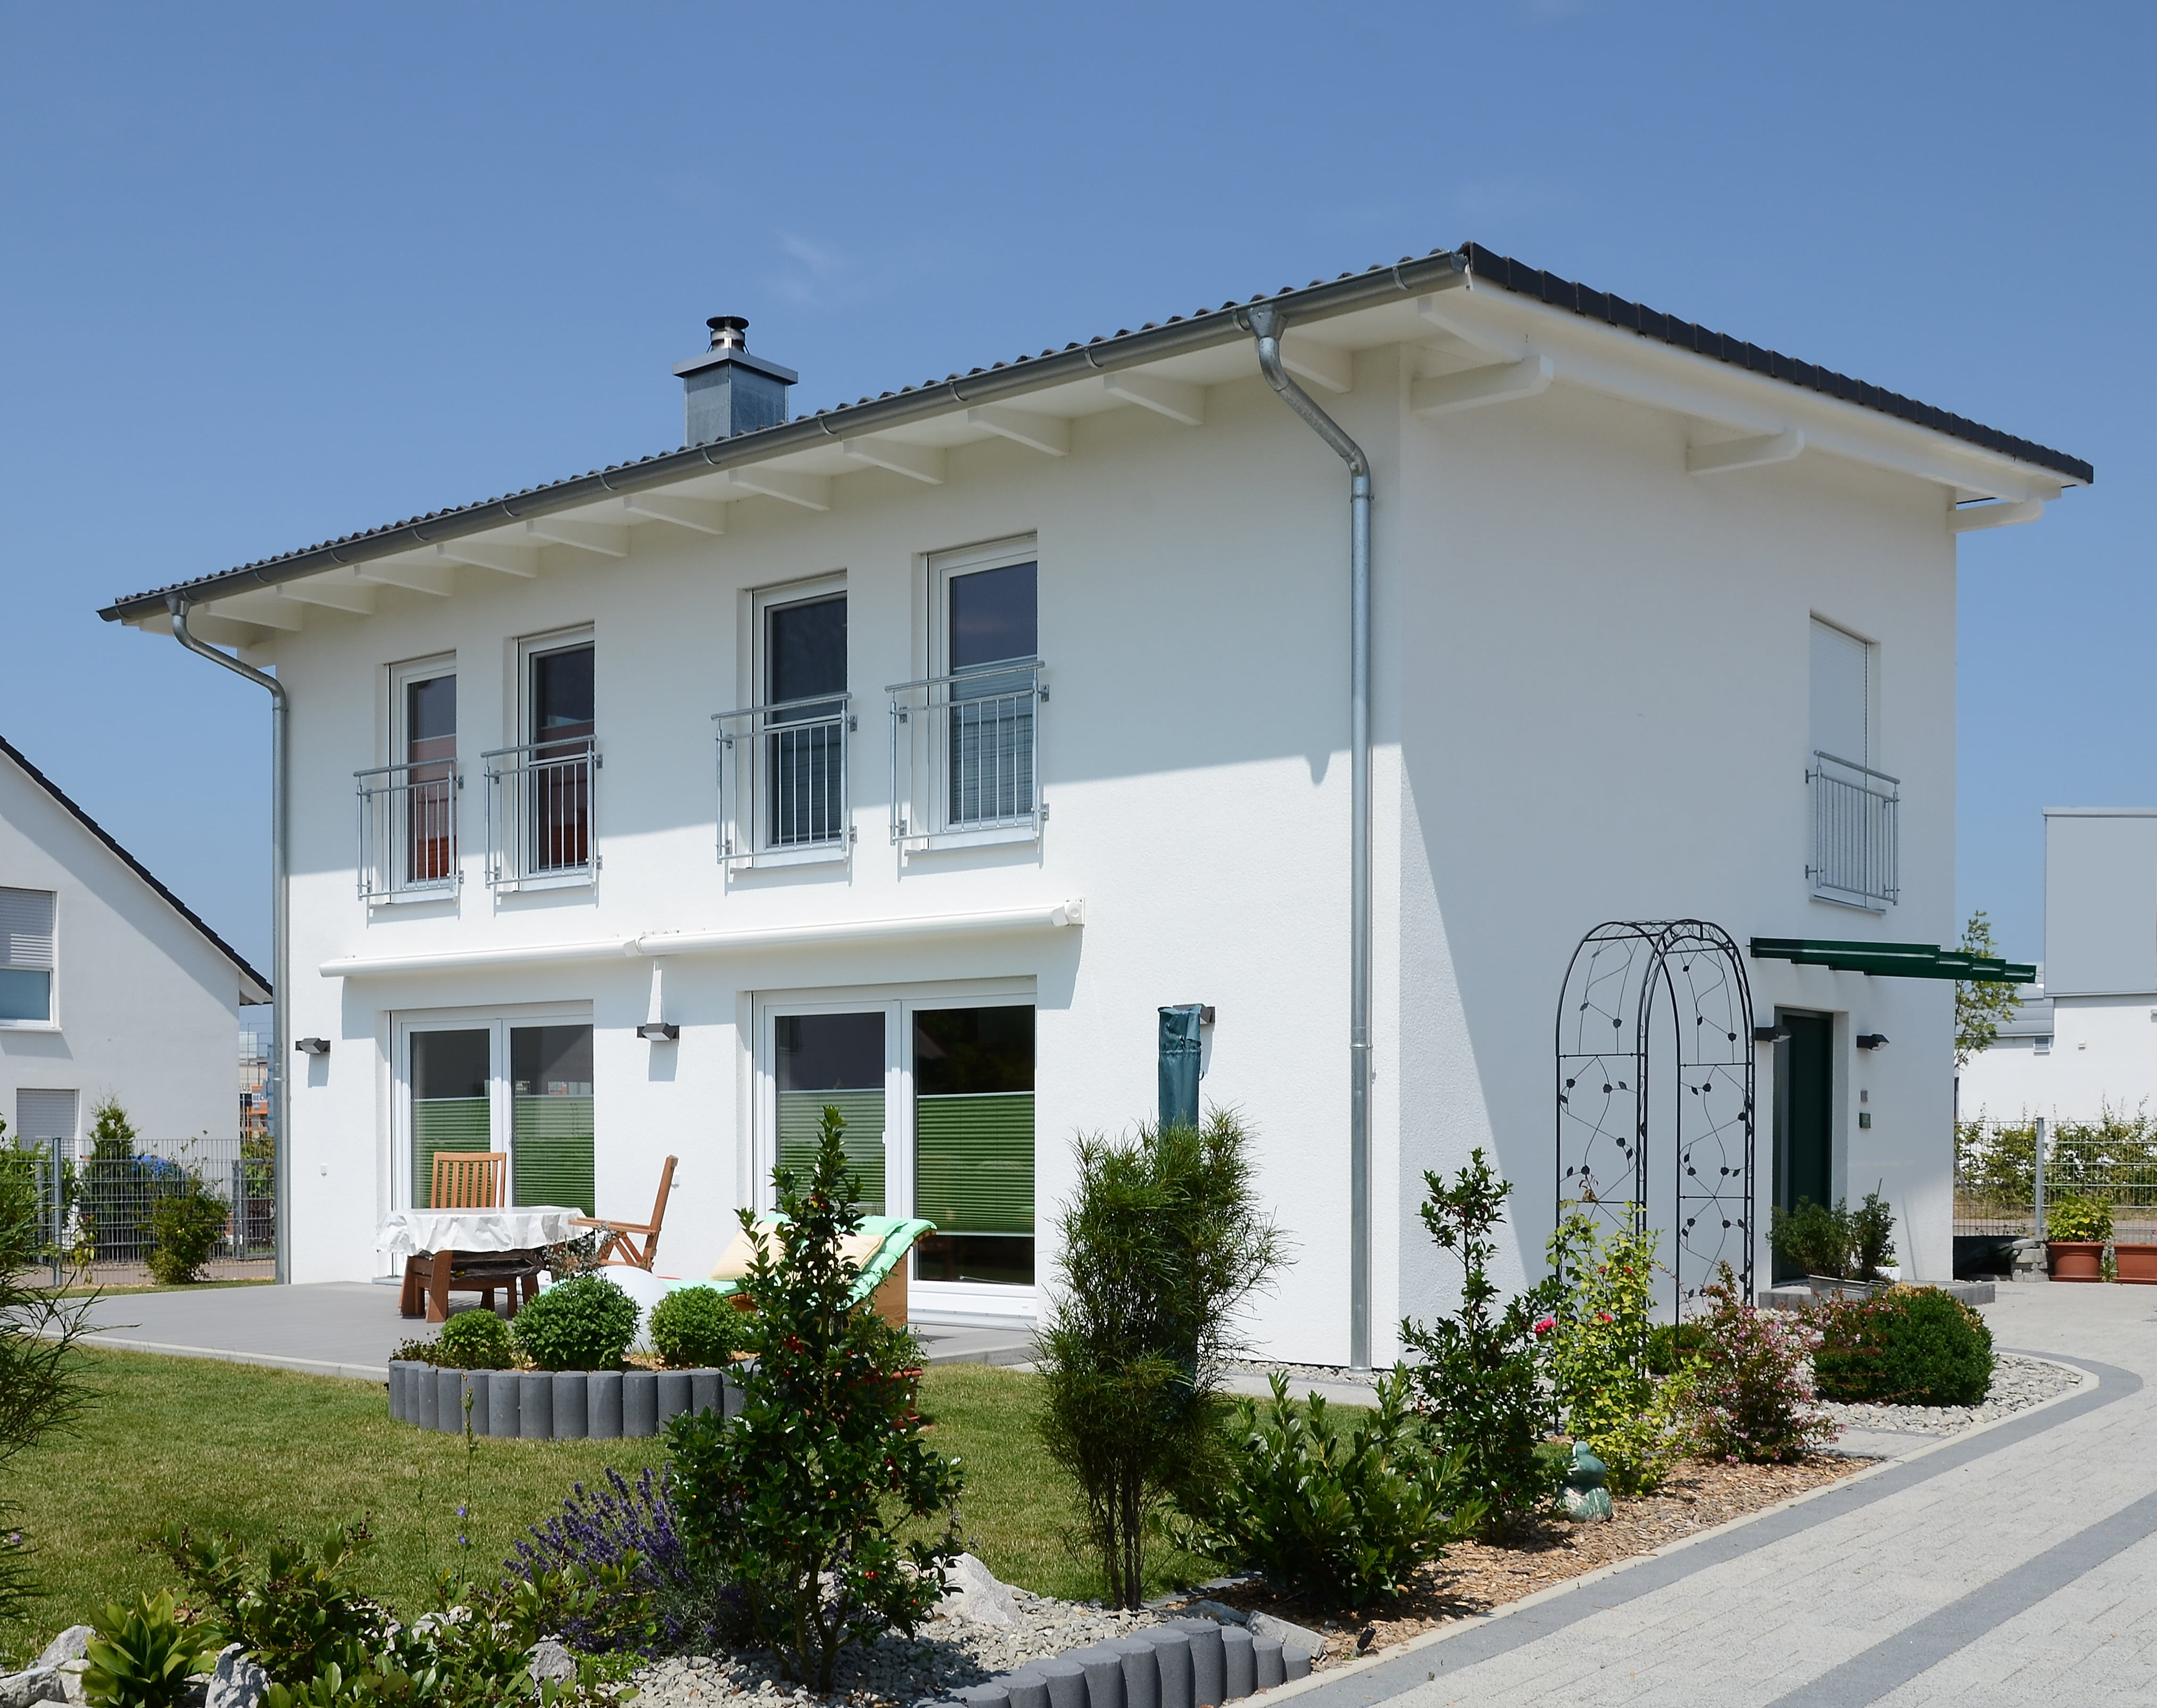 casa in xlam slovenia